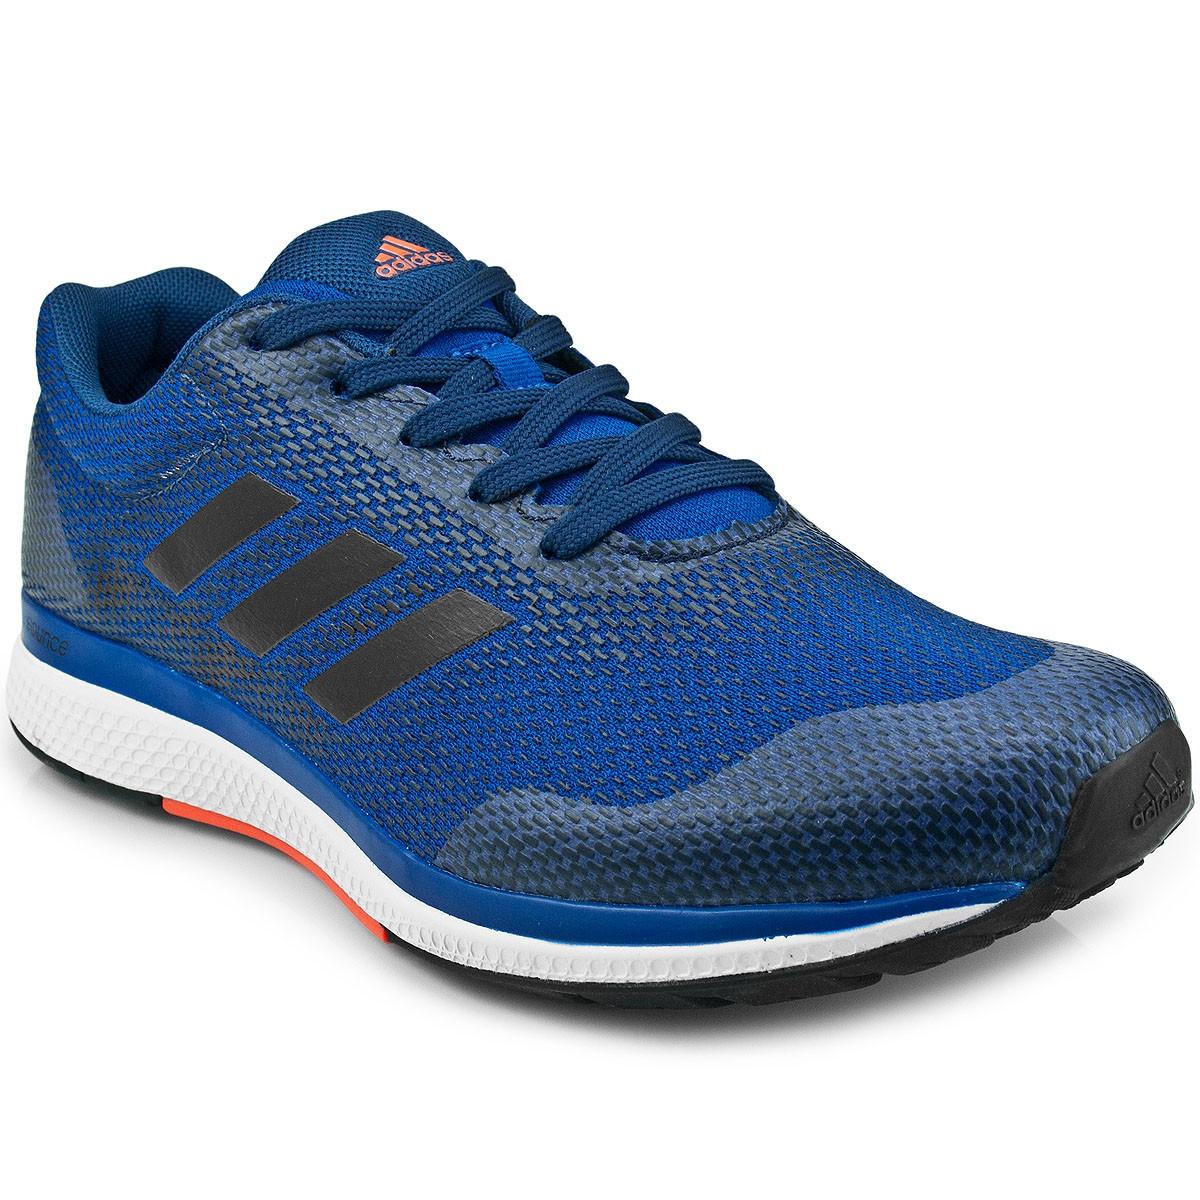 e222b93a169 Tênis Adidas Mana Bounce 2